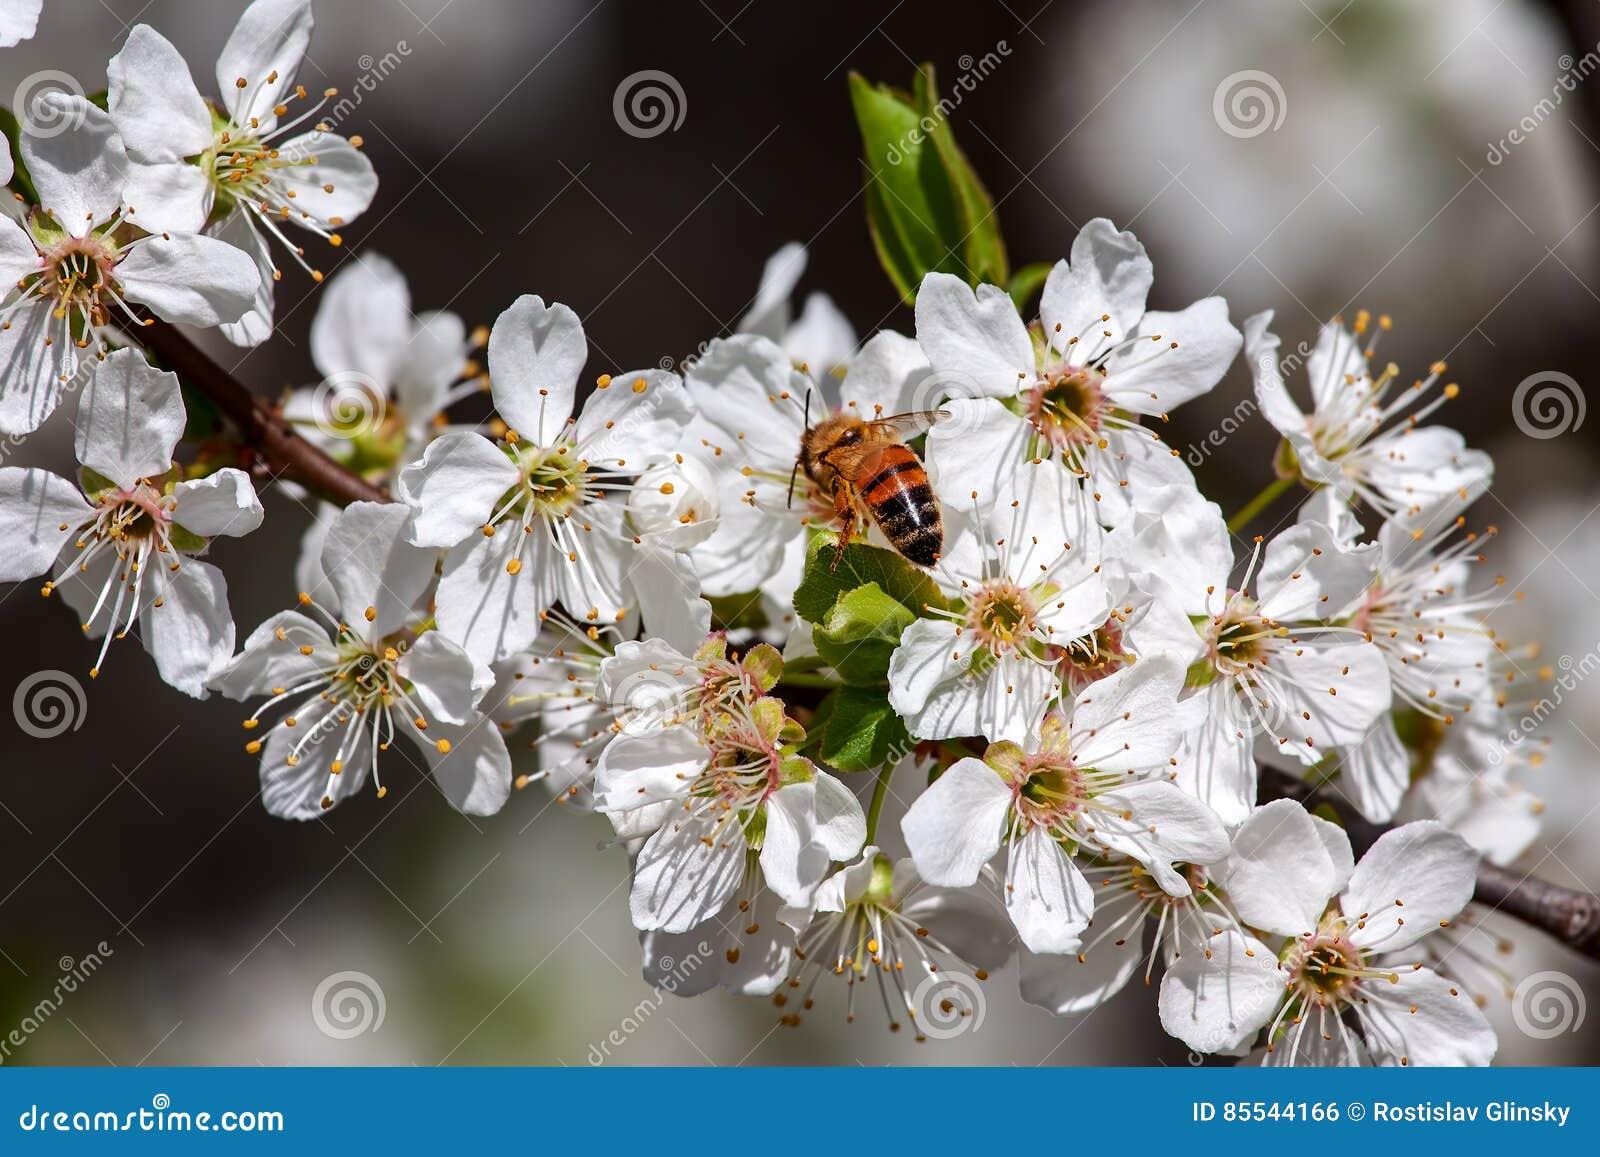 Fiori Bianchi In Primavera.Ape Fra I Fiori Bianchi In Primavera Fotografia Stock Immagine